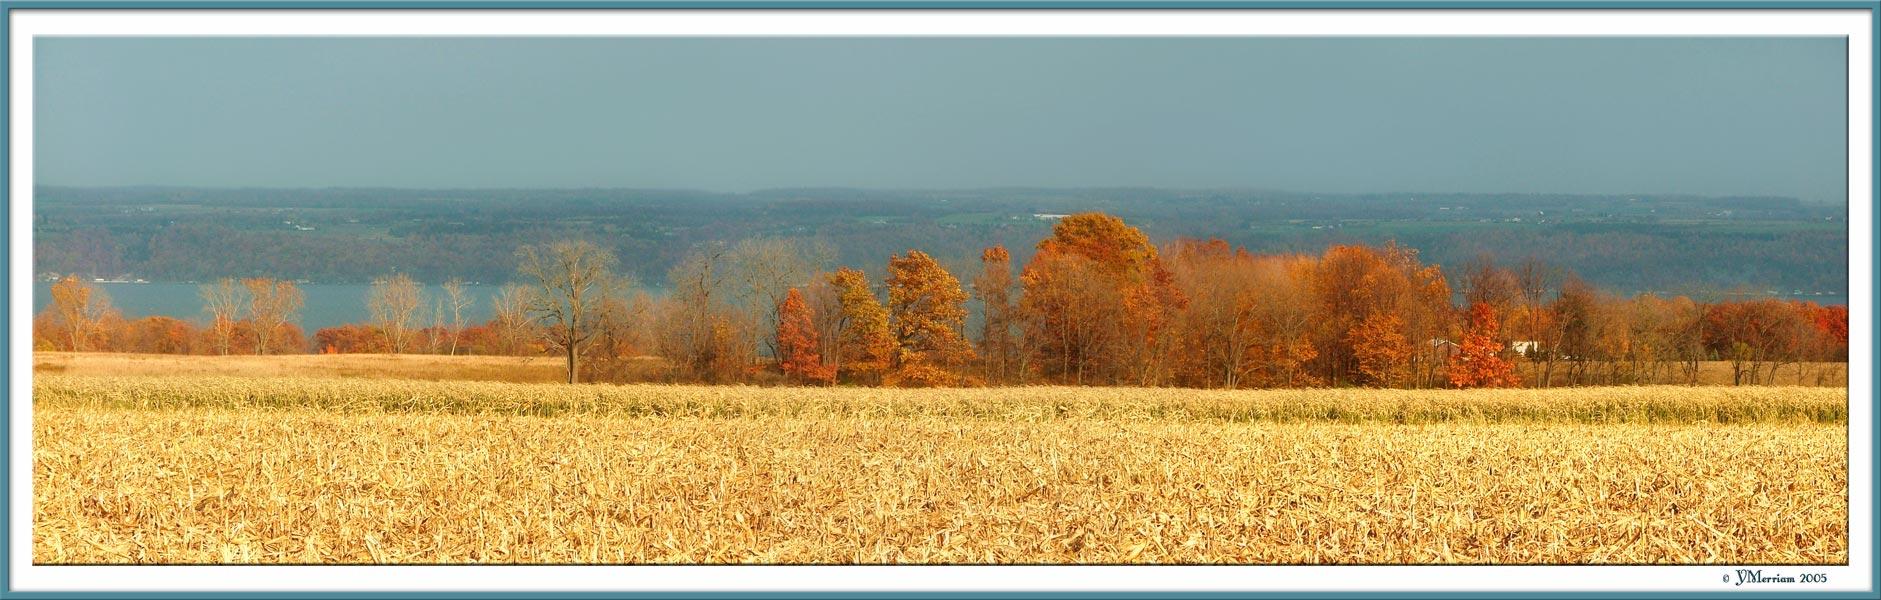 Rural New York